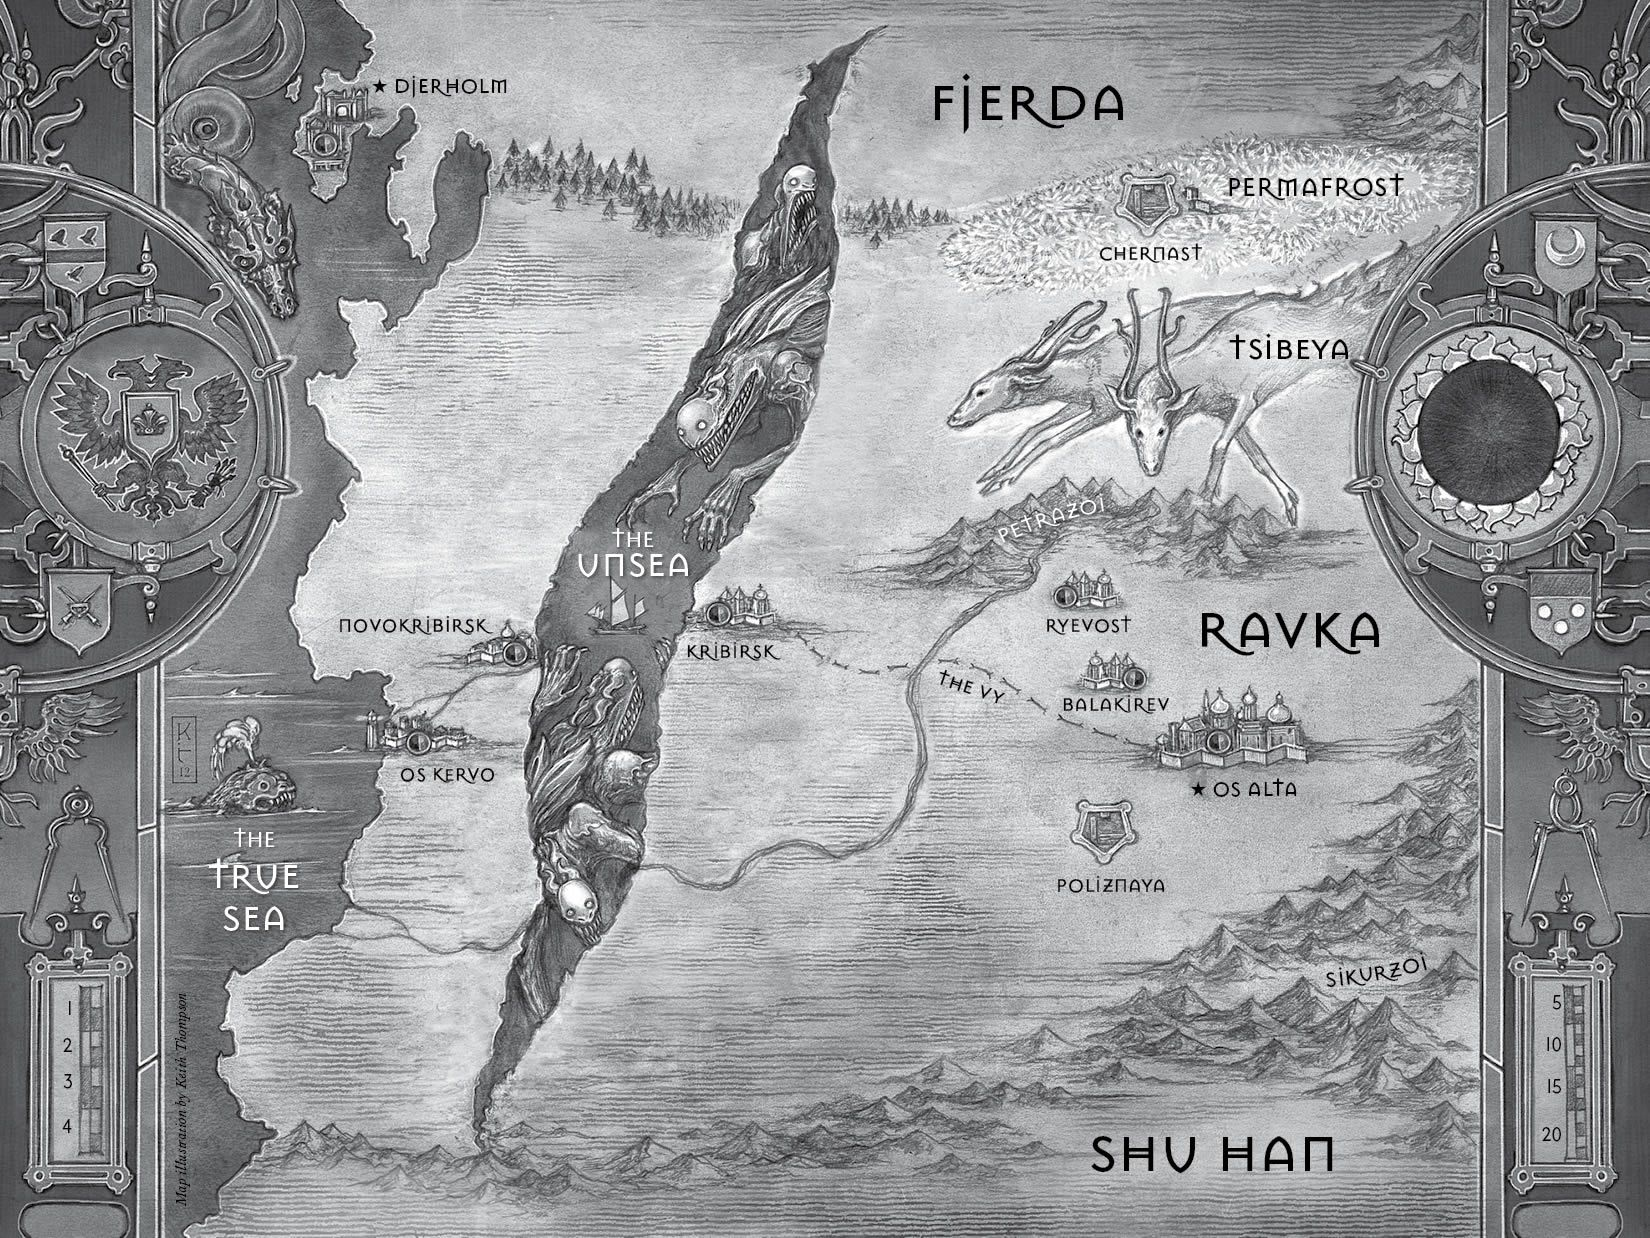 Best fictional worlds in ya young adult fiction pinterest best fictional worlds in ya the grisha trilogyleigh bardugofantasy mapbook fandomsworld gumiabroncs Gallery